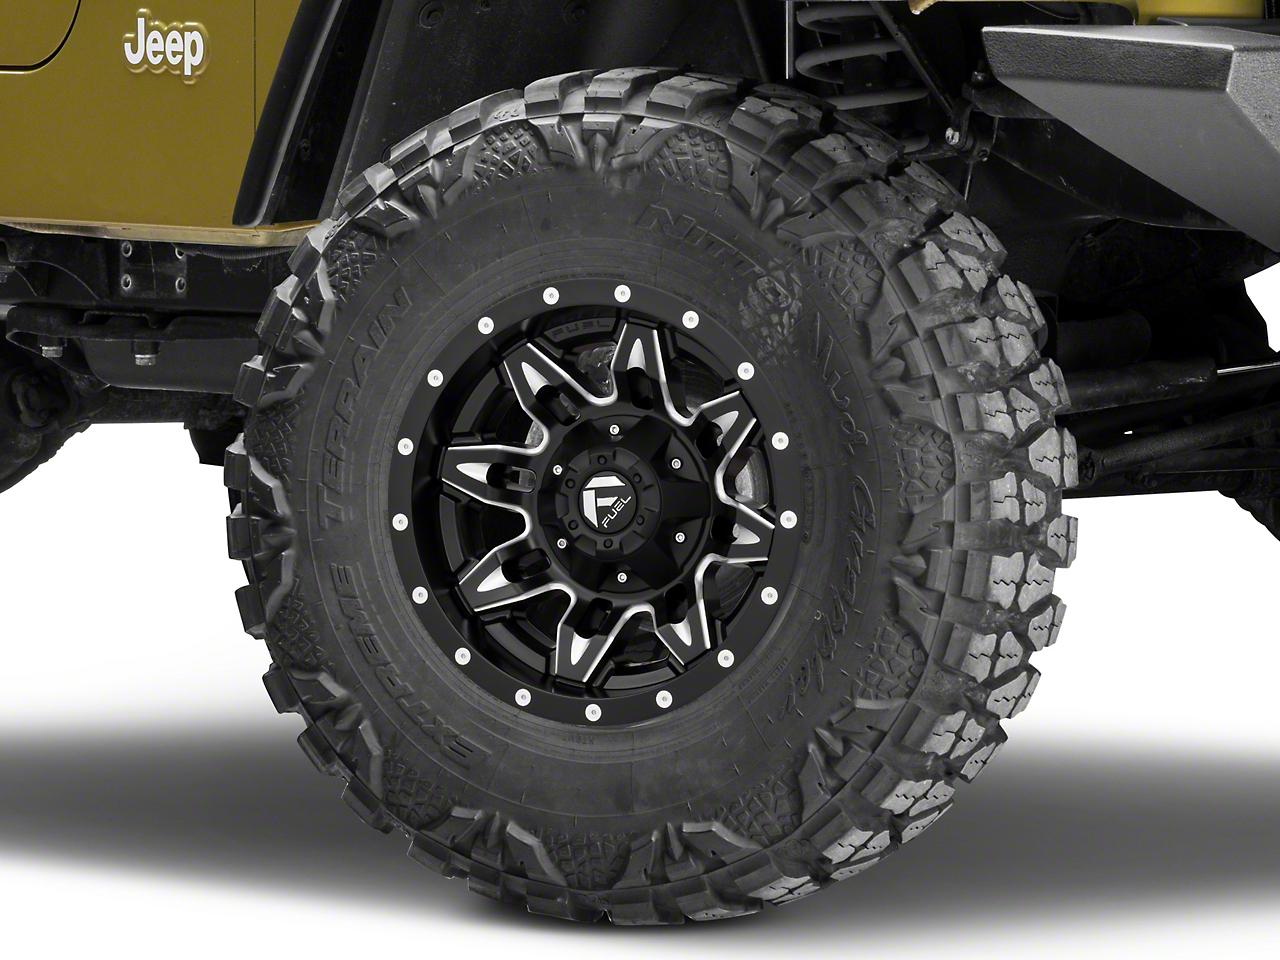 Fuel Wheels Lethal Black Milled Wheel - 15x8 (87-06 Wrangler YJ & TJ)